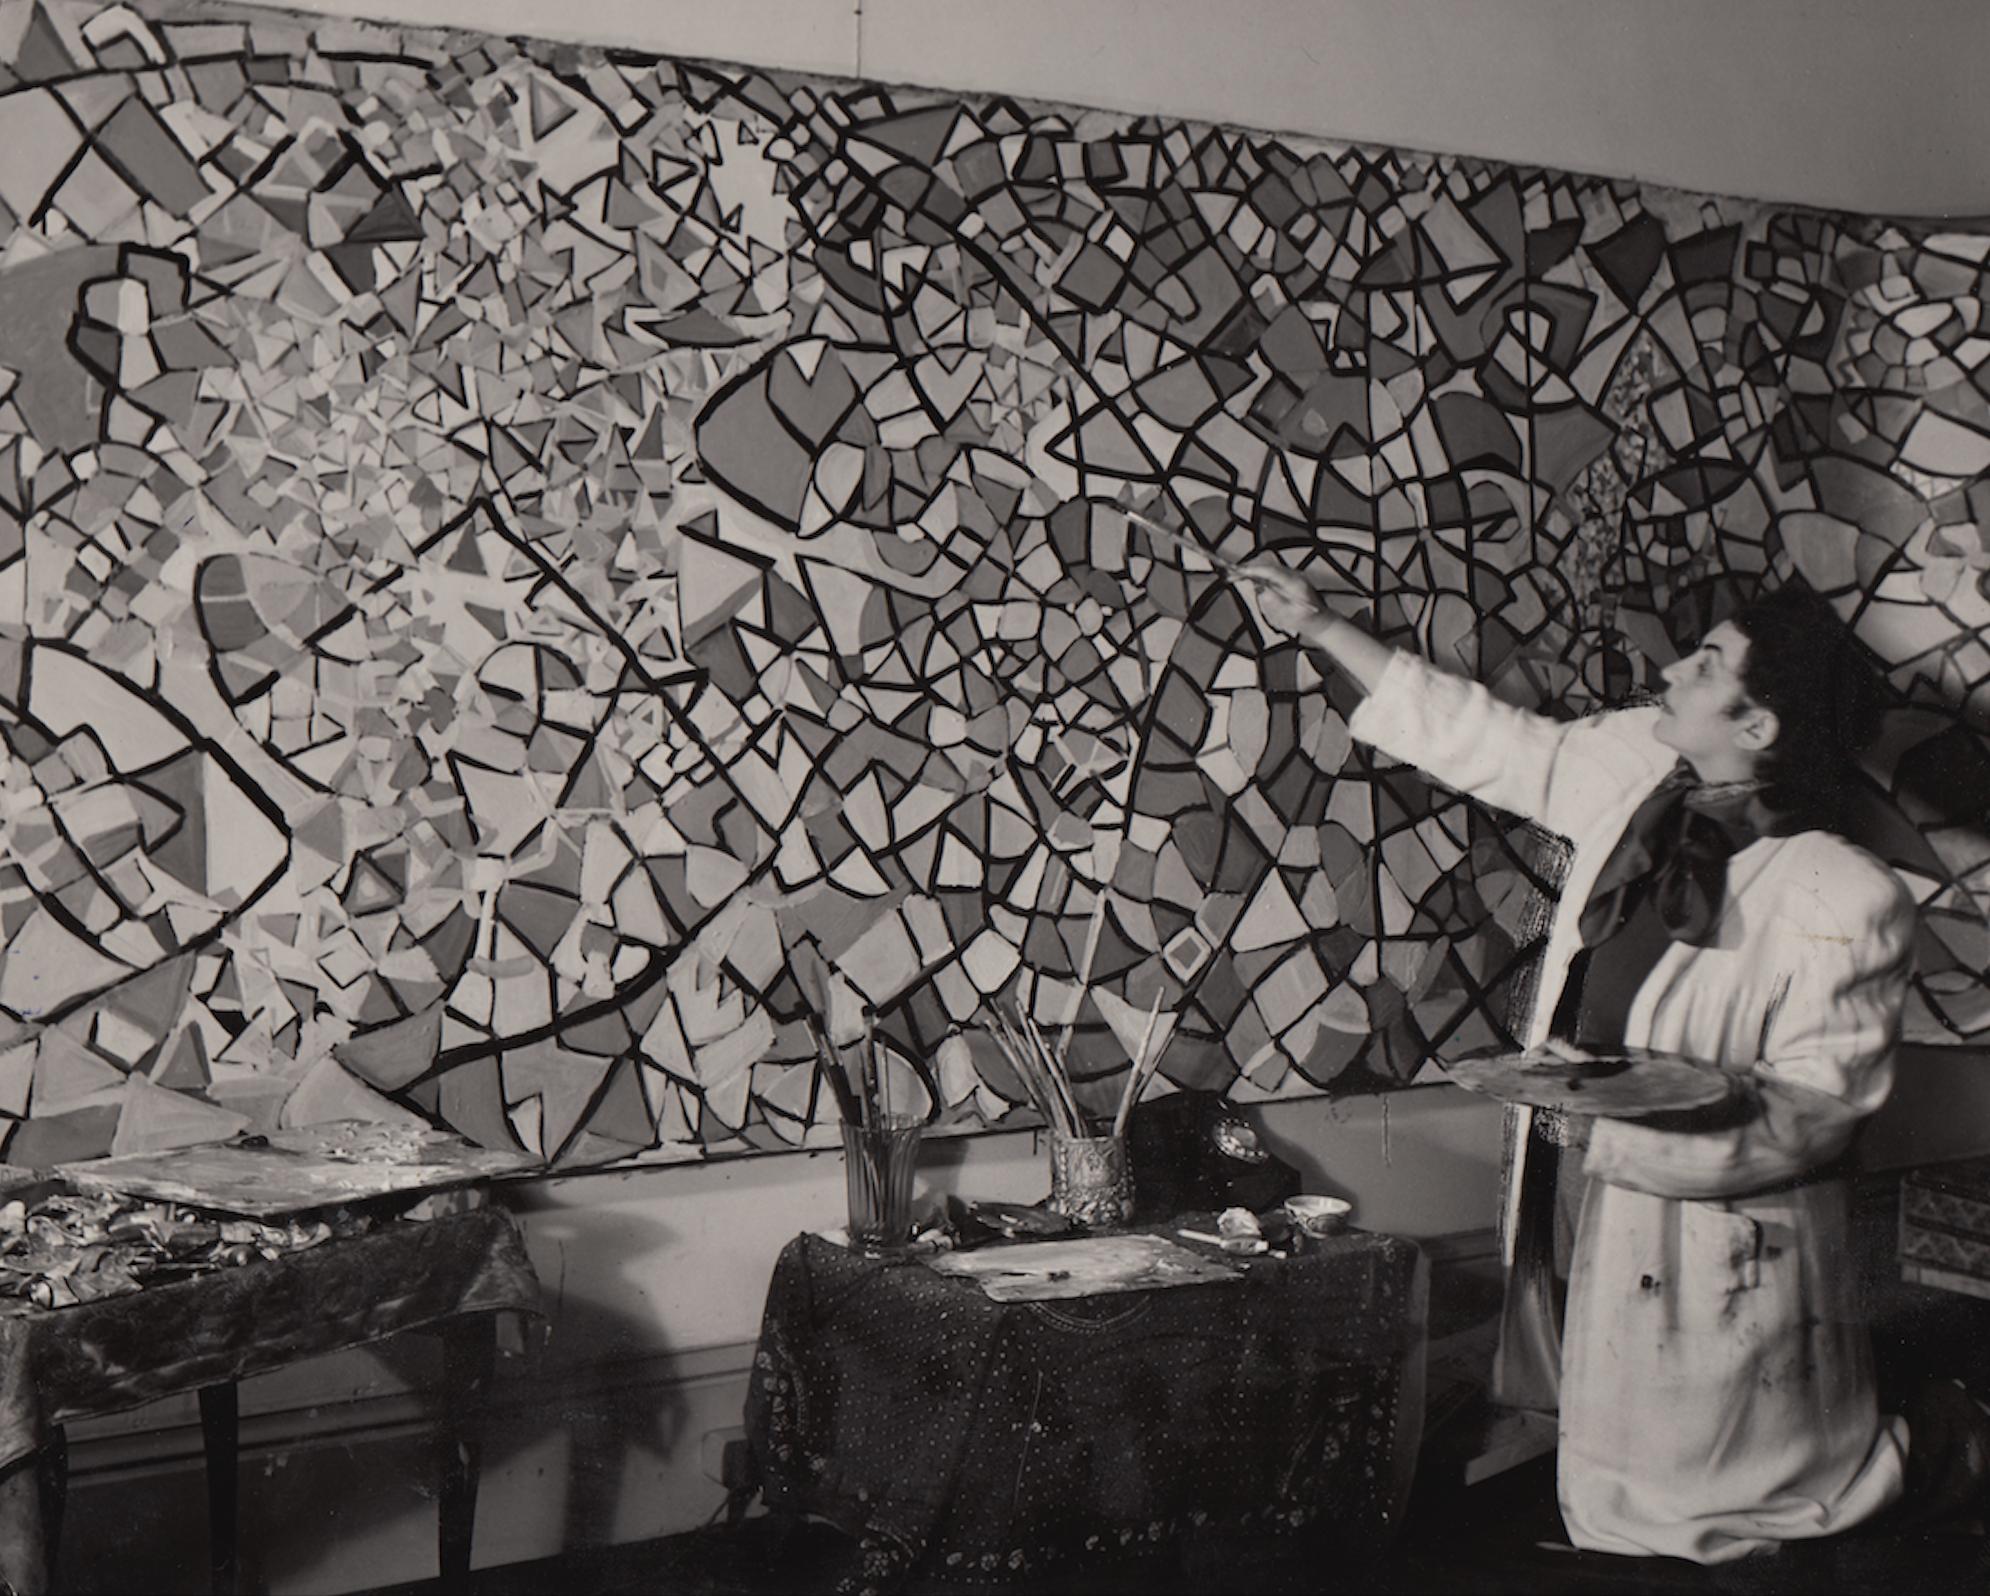 In the London studio painting Voyage of the Man Moon, 1949 (Fahrelnissa Zeid, Painter of Inner Worlds, Lalidi-Hanieh, Adila, p. 103)